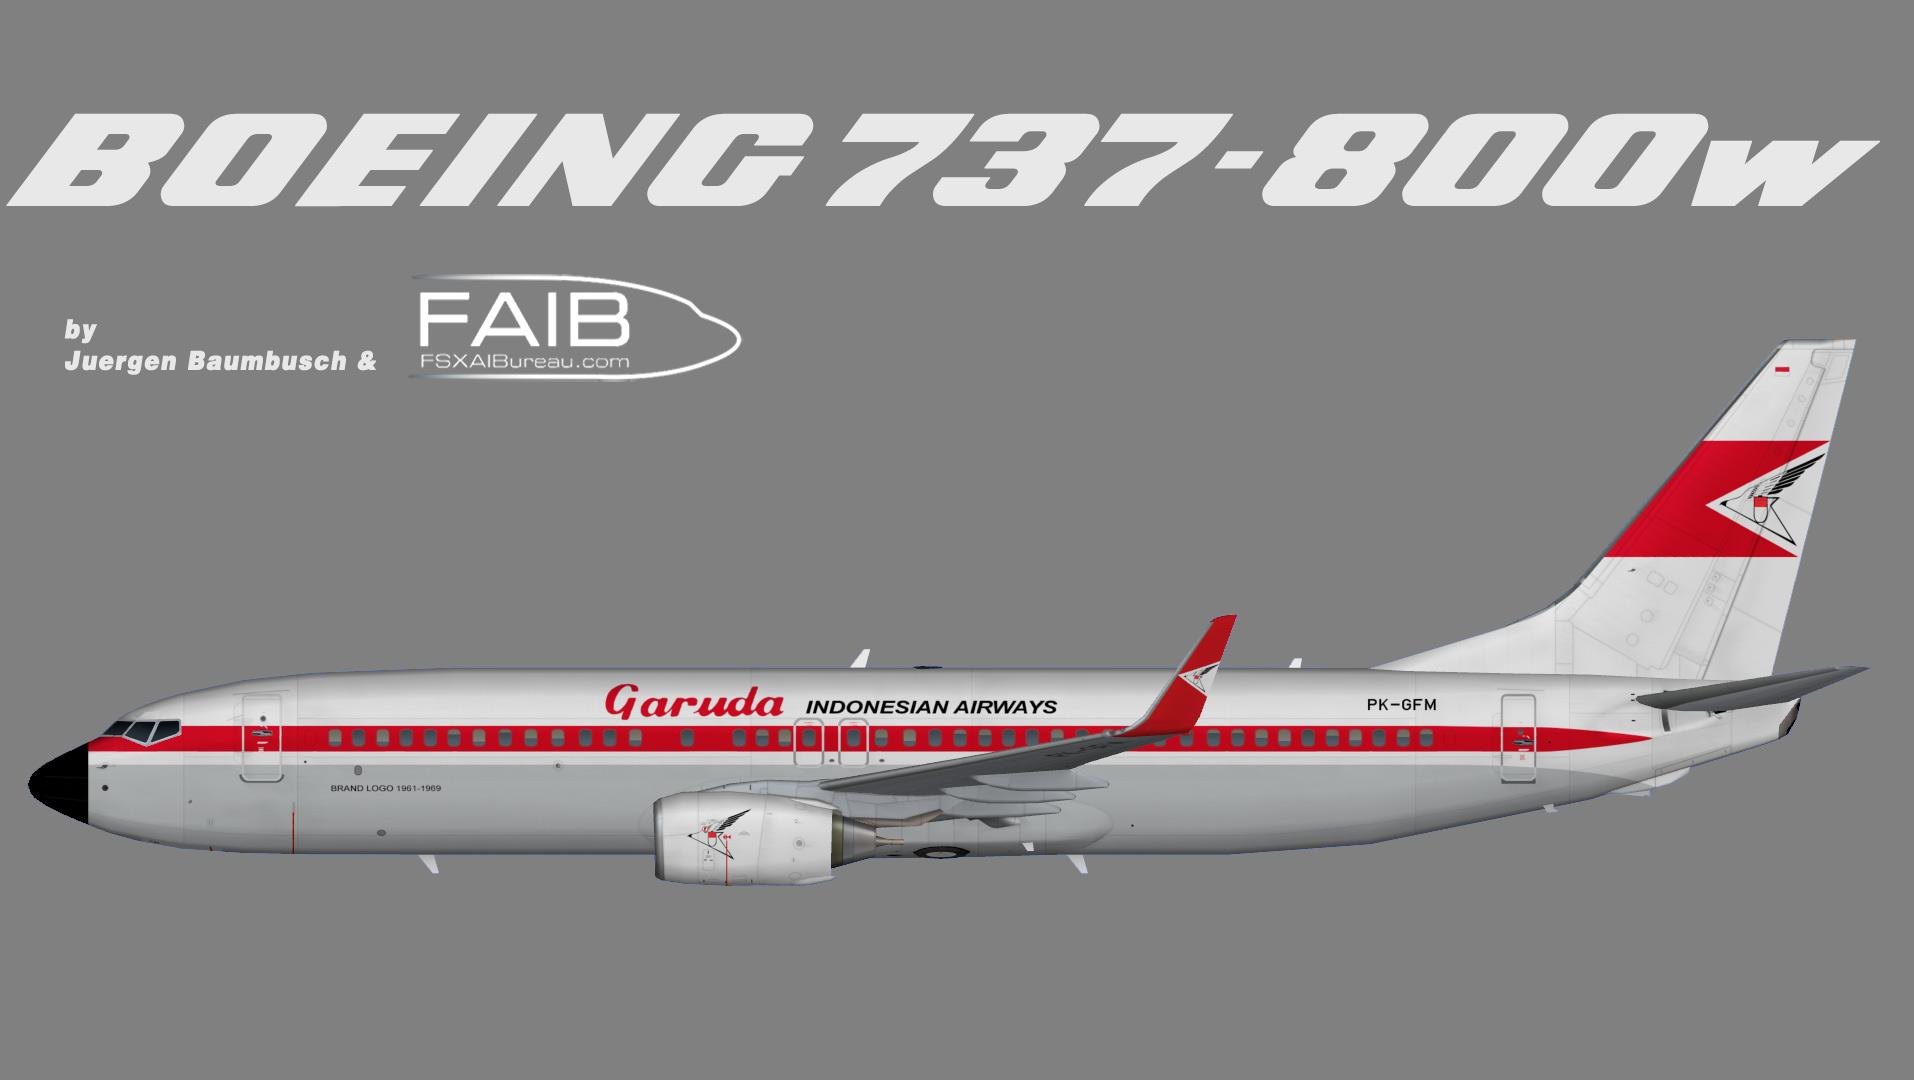 Garuda Indonesia Boeing 737-800w Retro Logojet 1963 – 1969